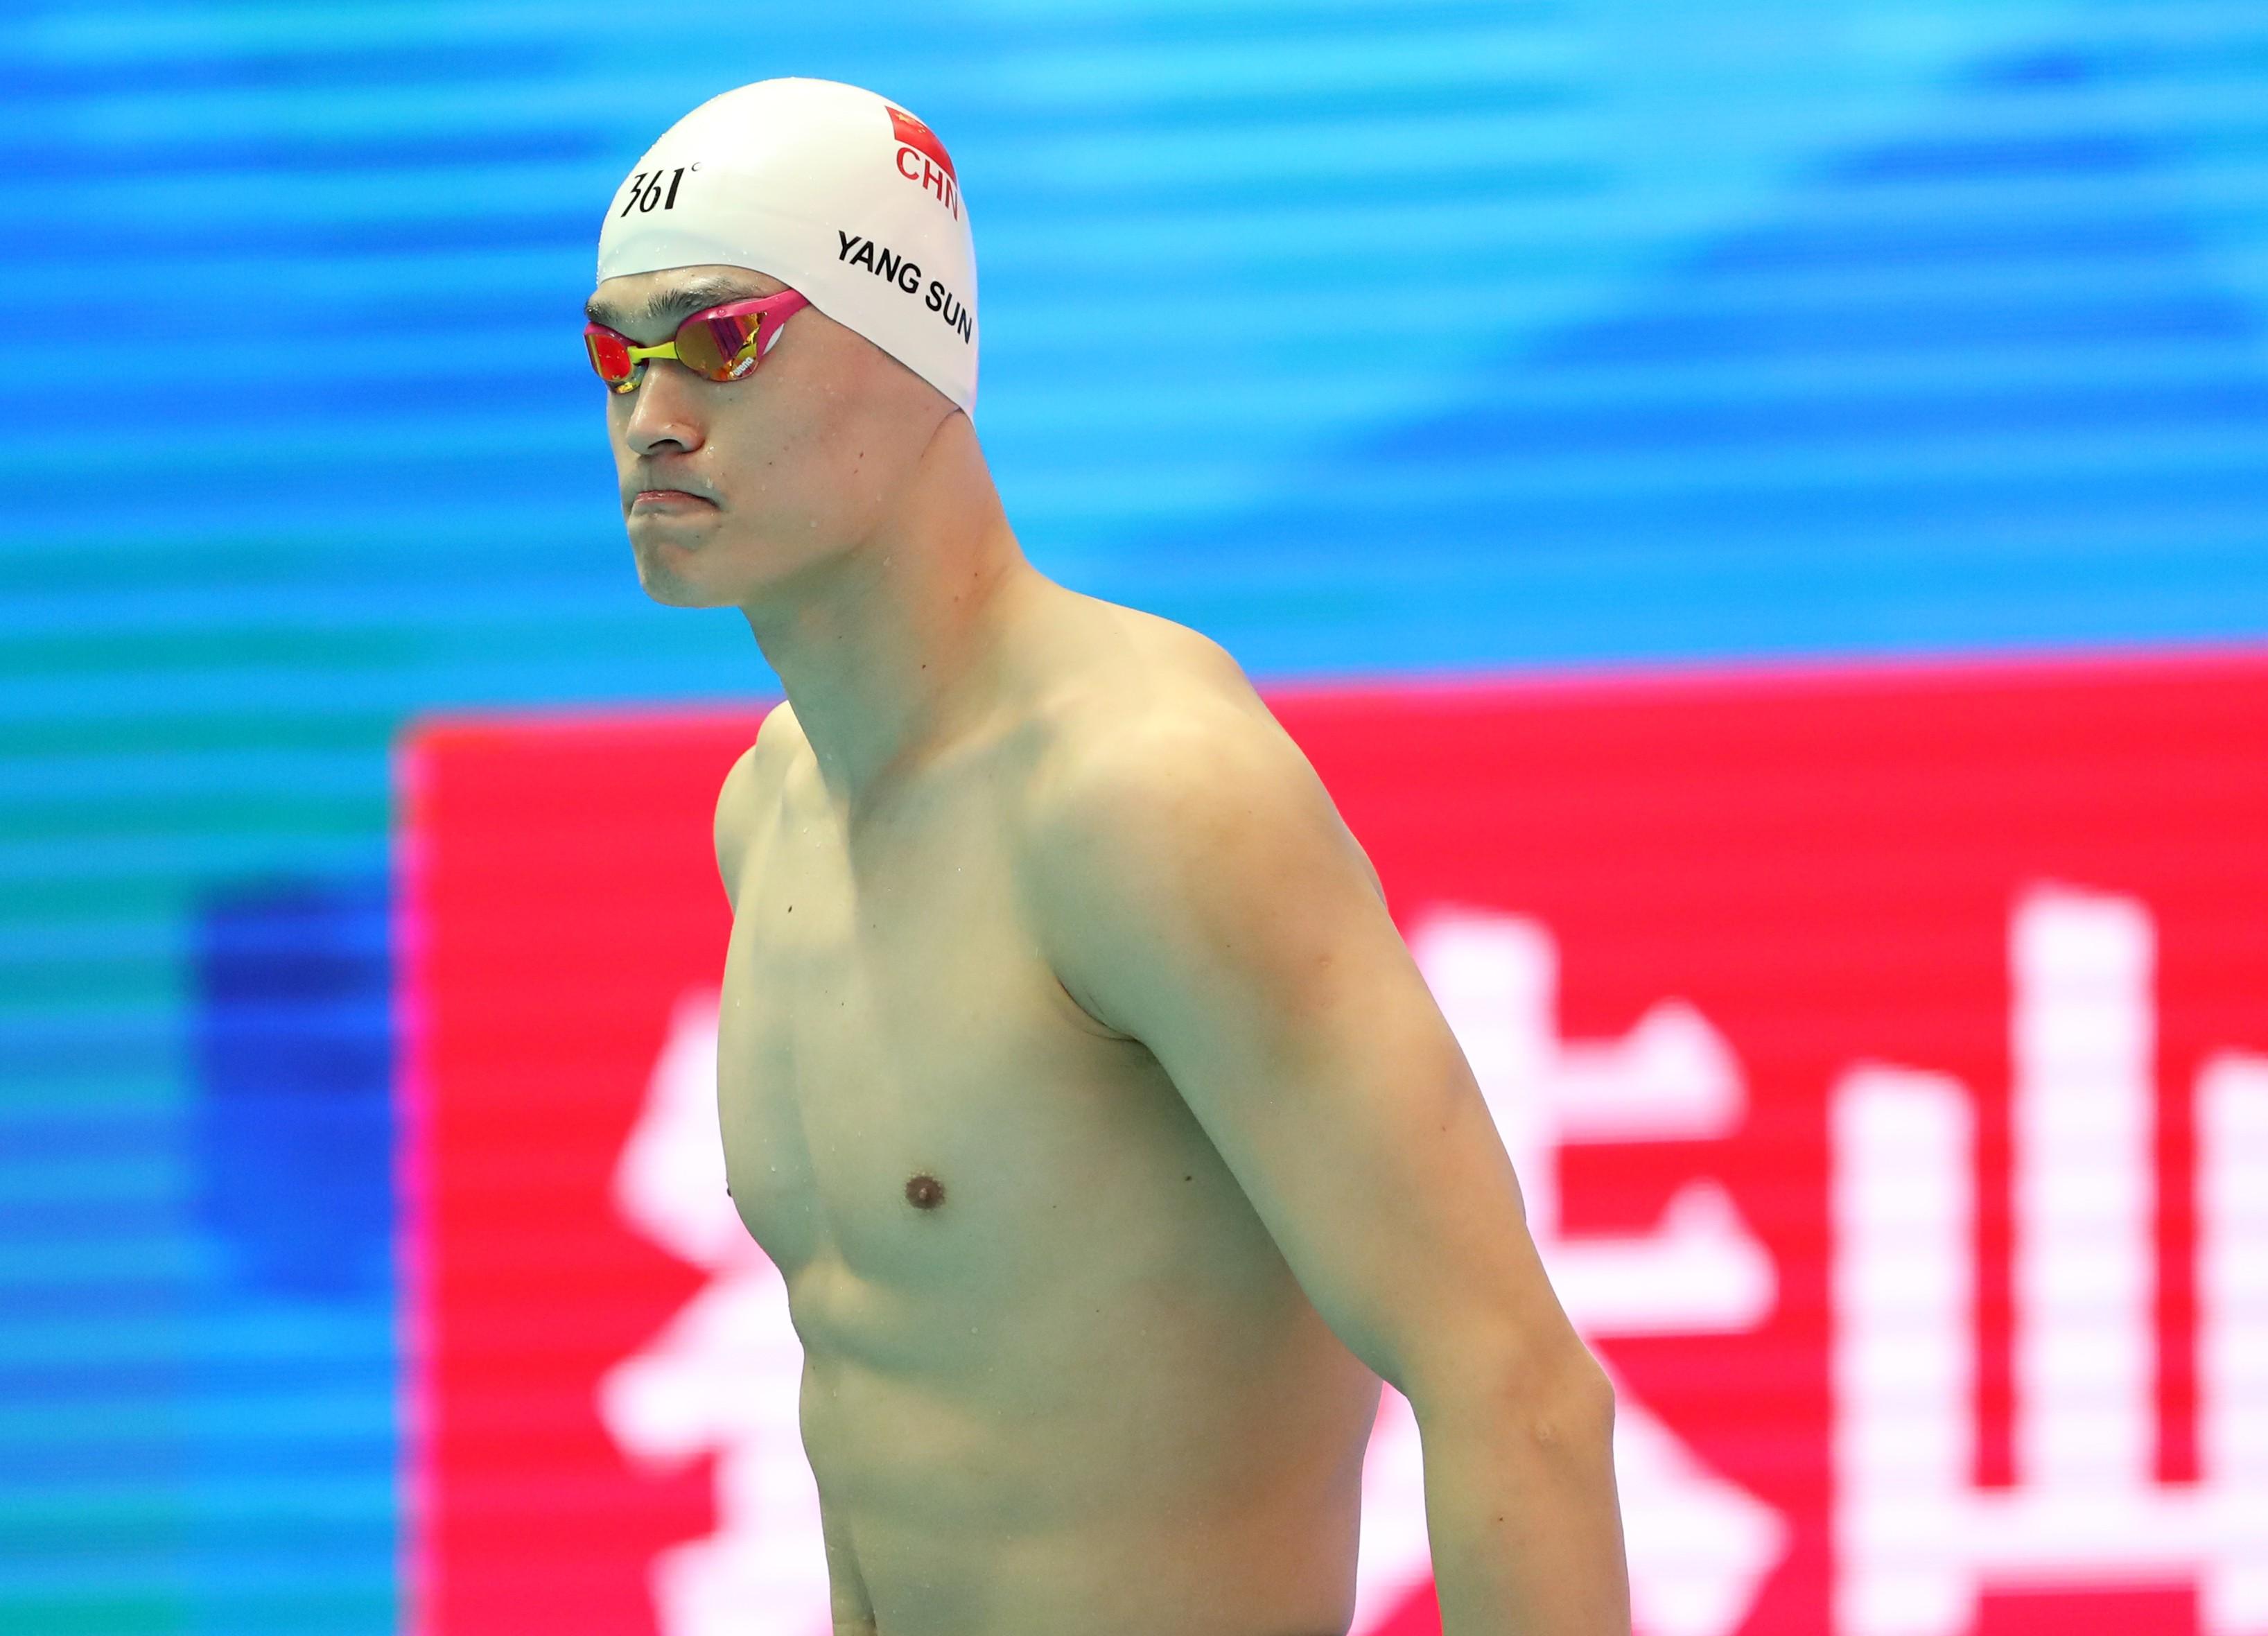 Swimming at the 2019 World Aquatics Championships – Men's 200 metre freestyle